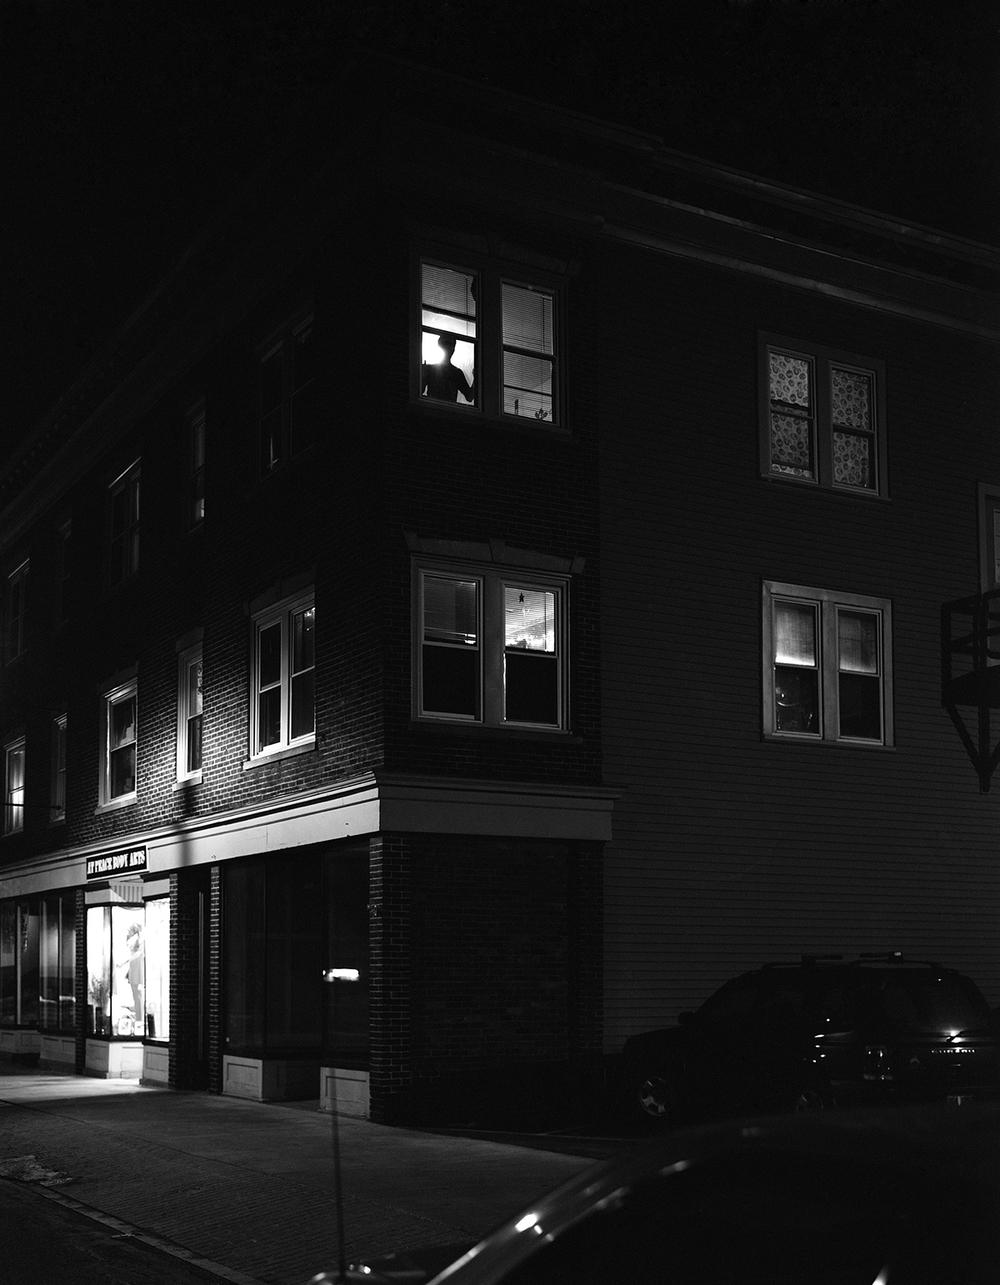 Darren Bilodeau,  Jasper's Apartment, silver gelatin print, 11x14, 2015